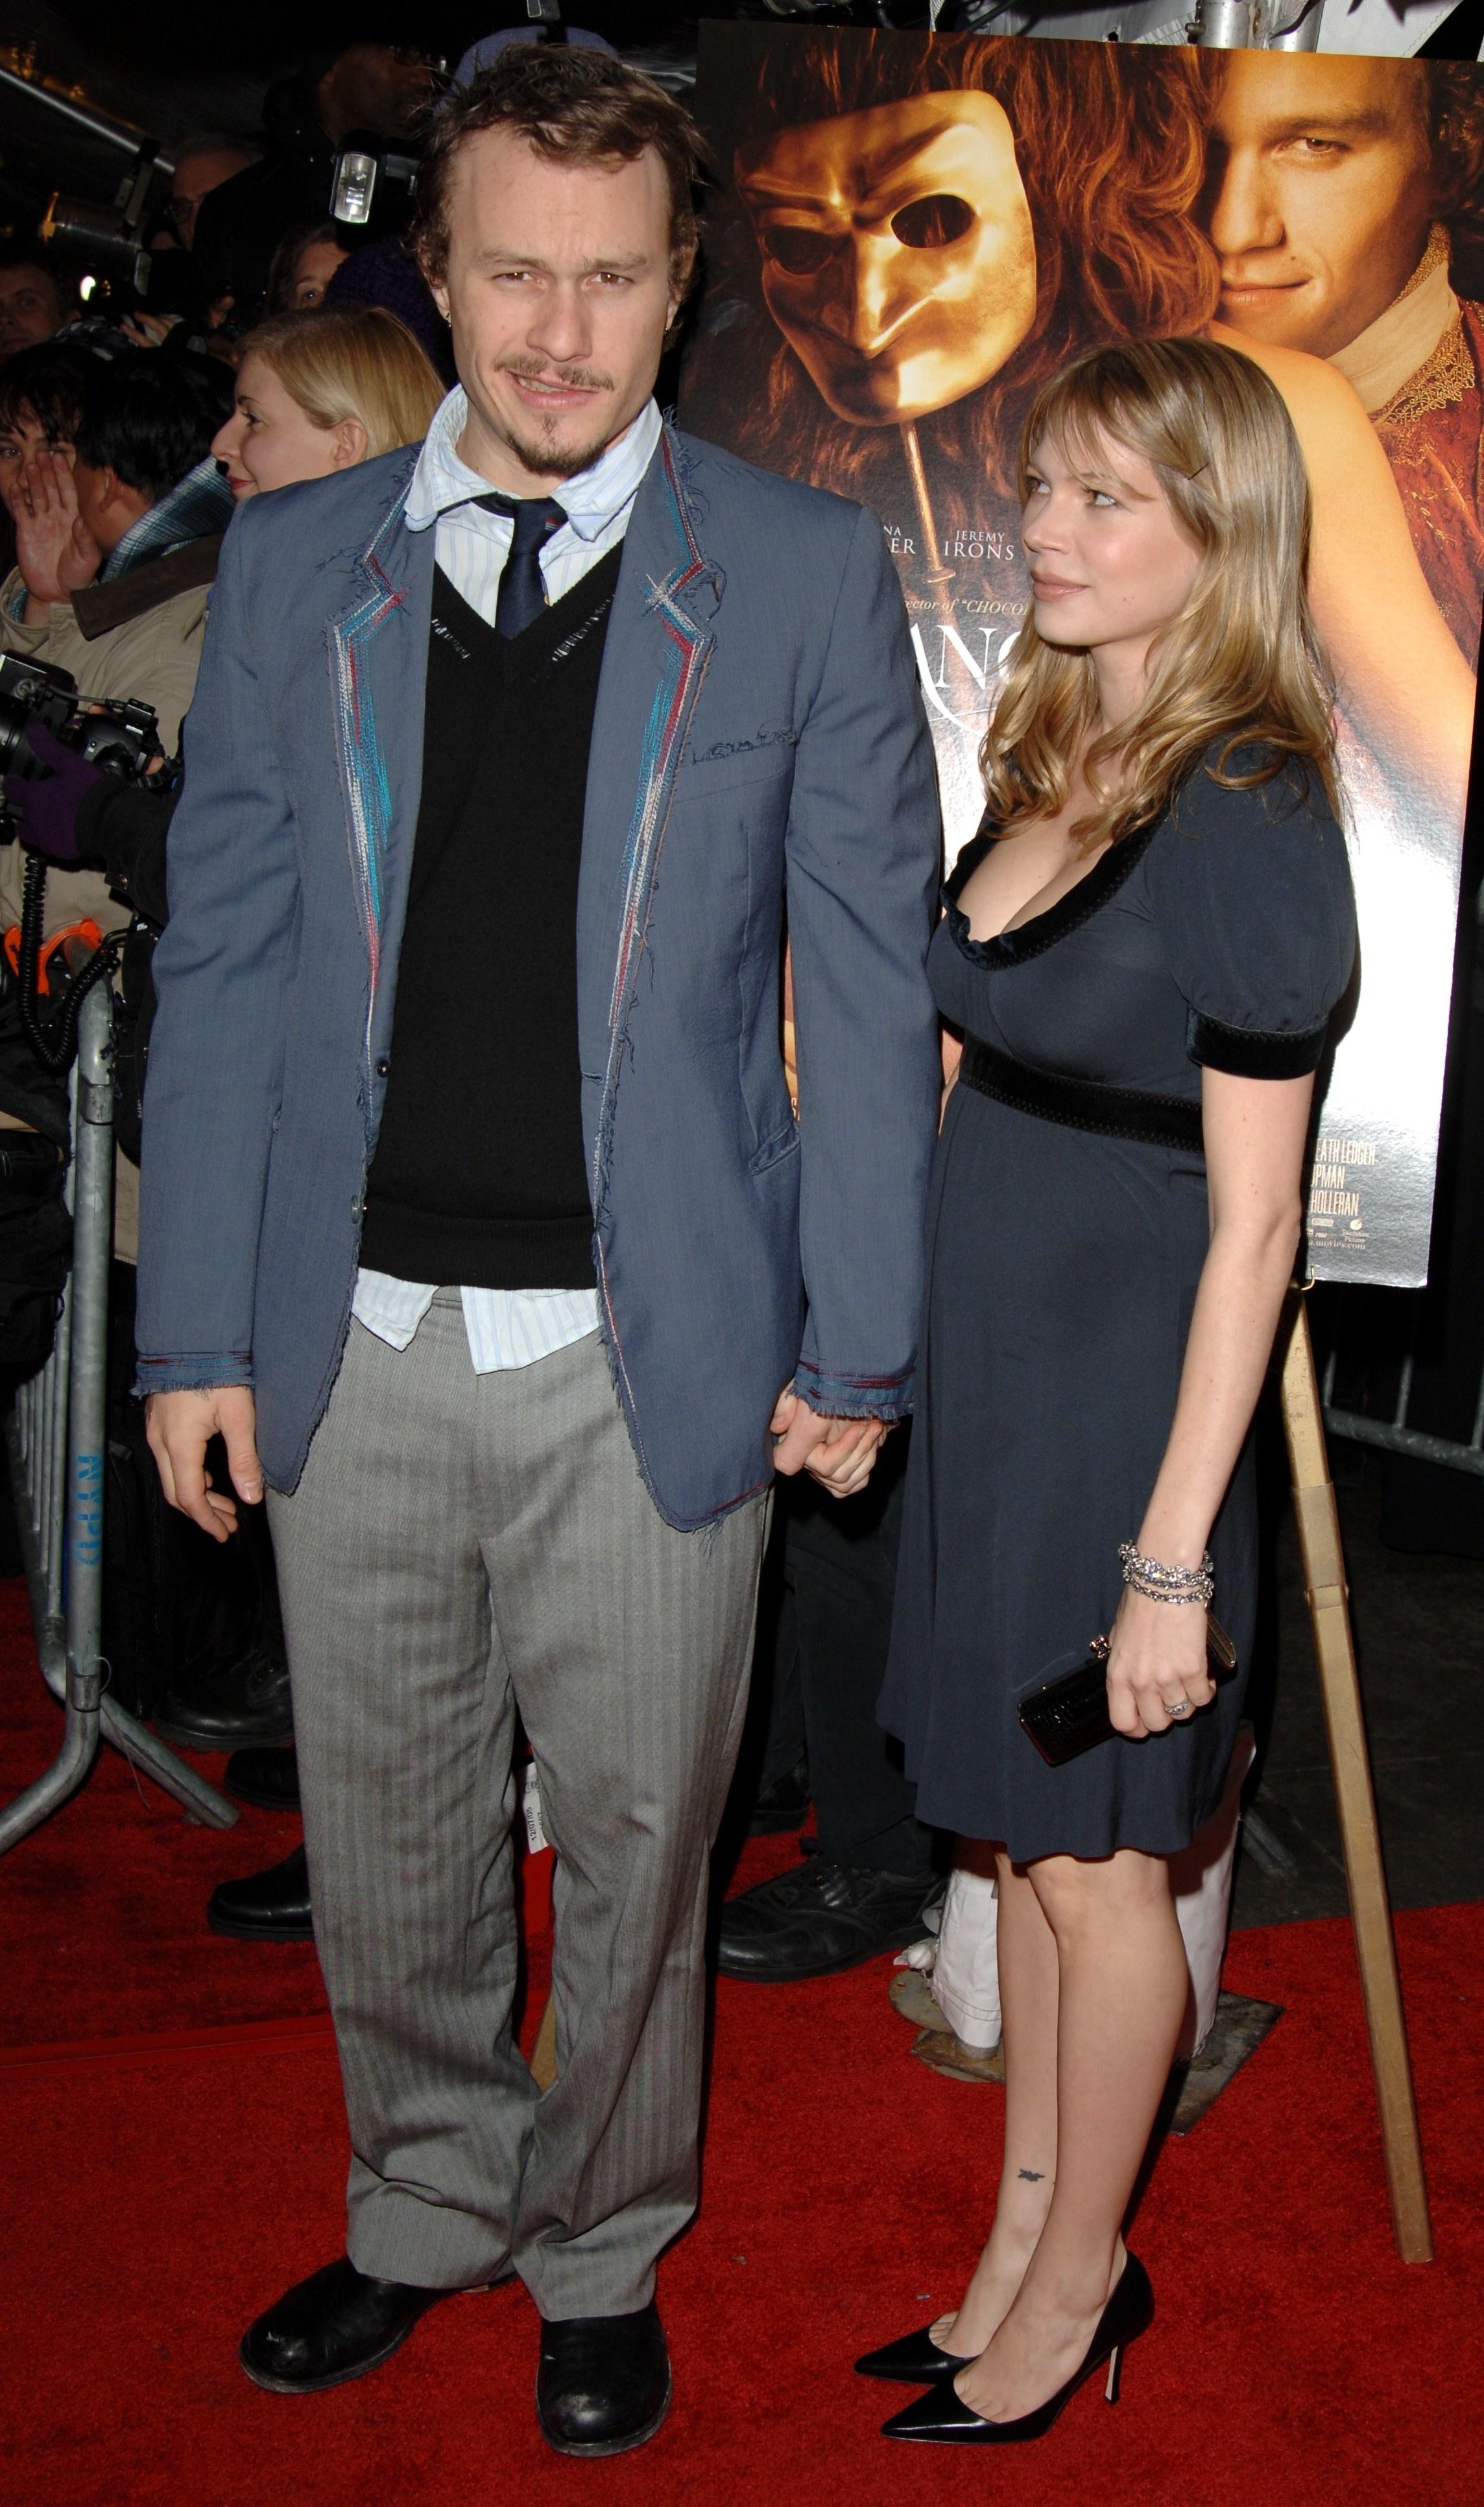 Heath Ledger andMichelle Williams at a movie premiere